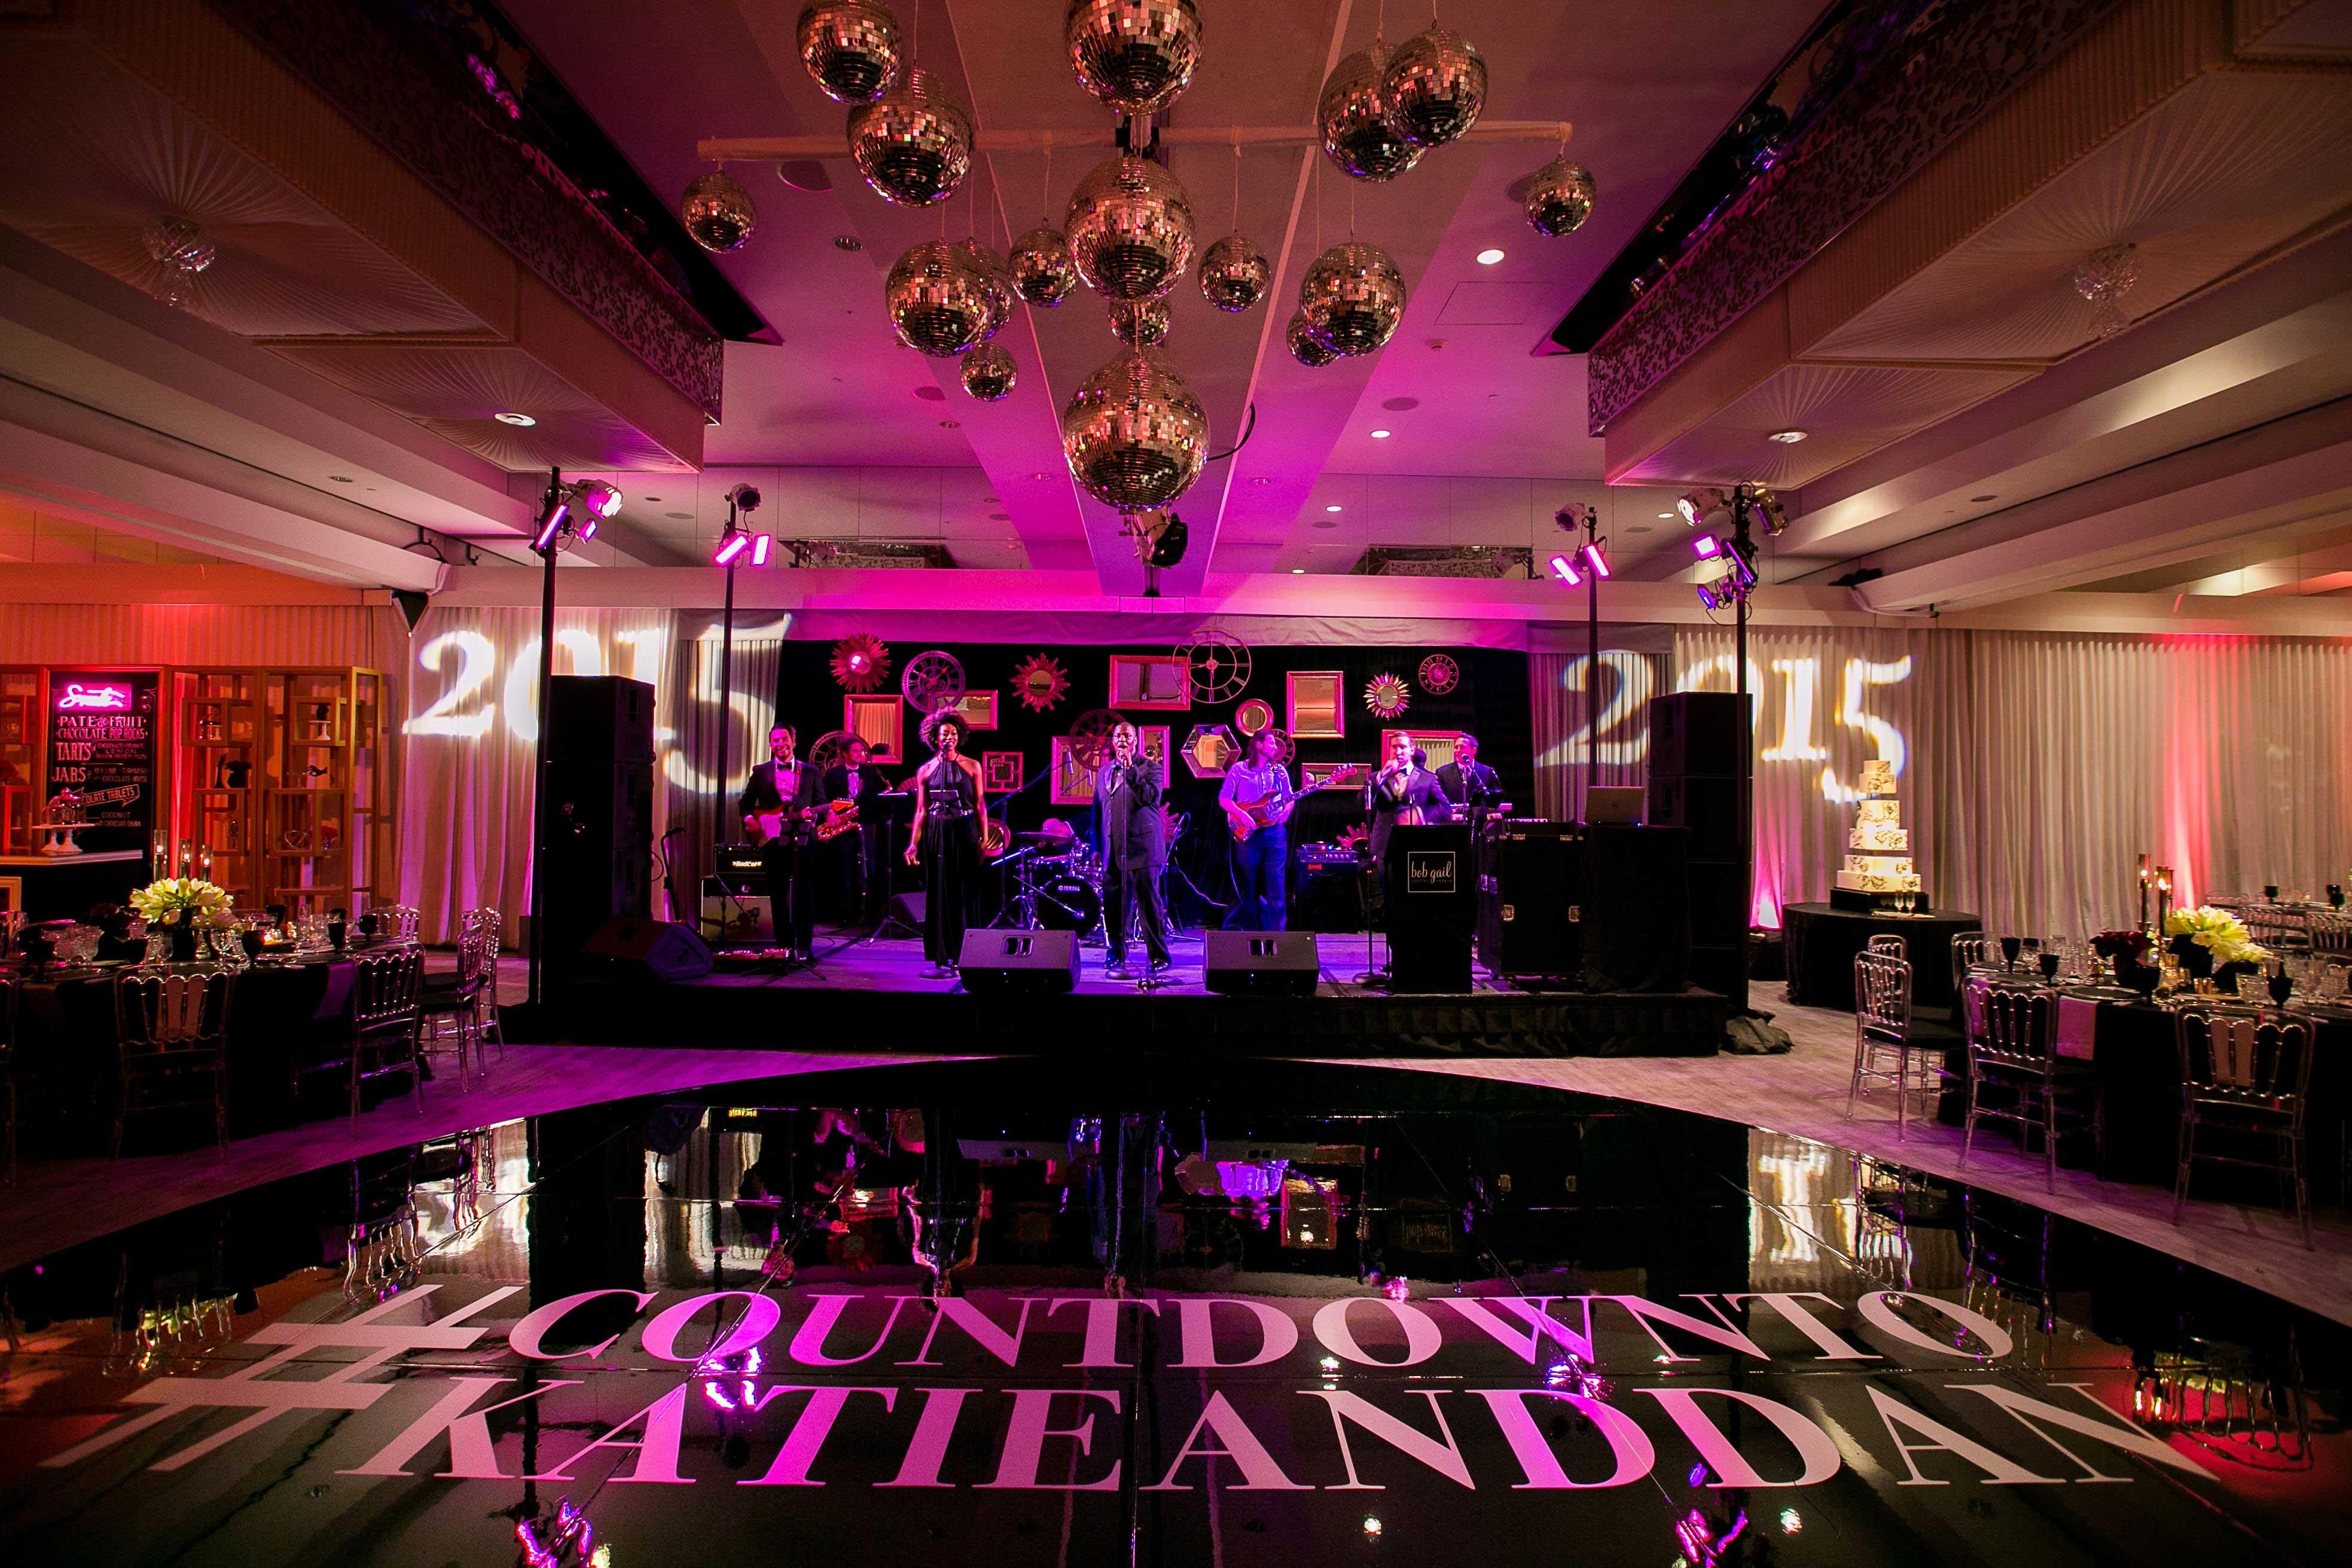 Dark and moody wedding color palette ideas New Year's eve wedding dance floor dark dance floor lighting